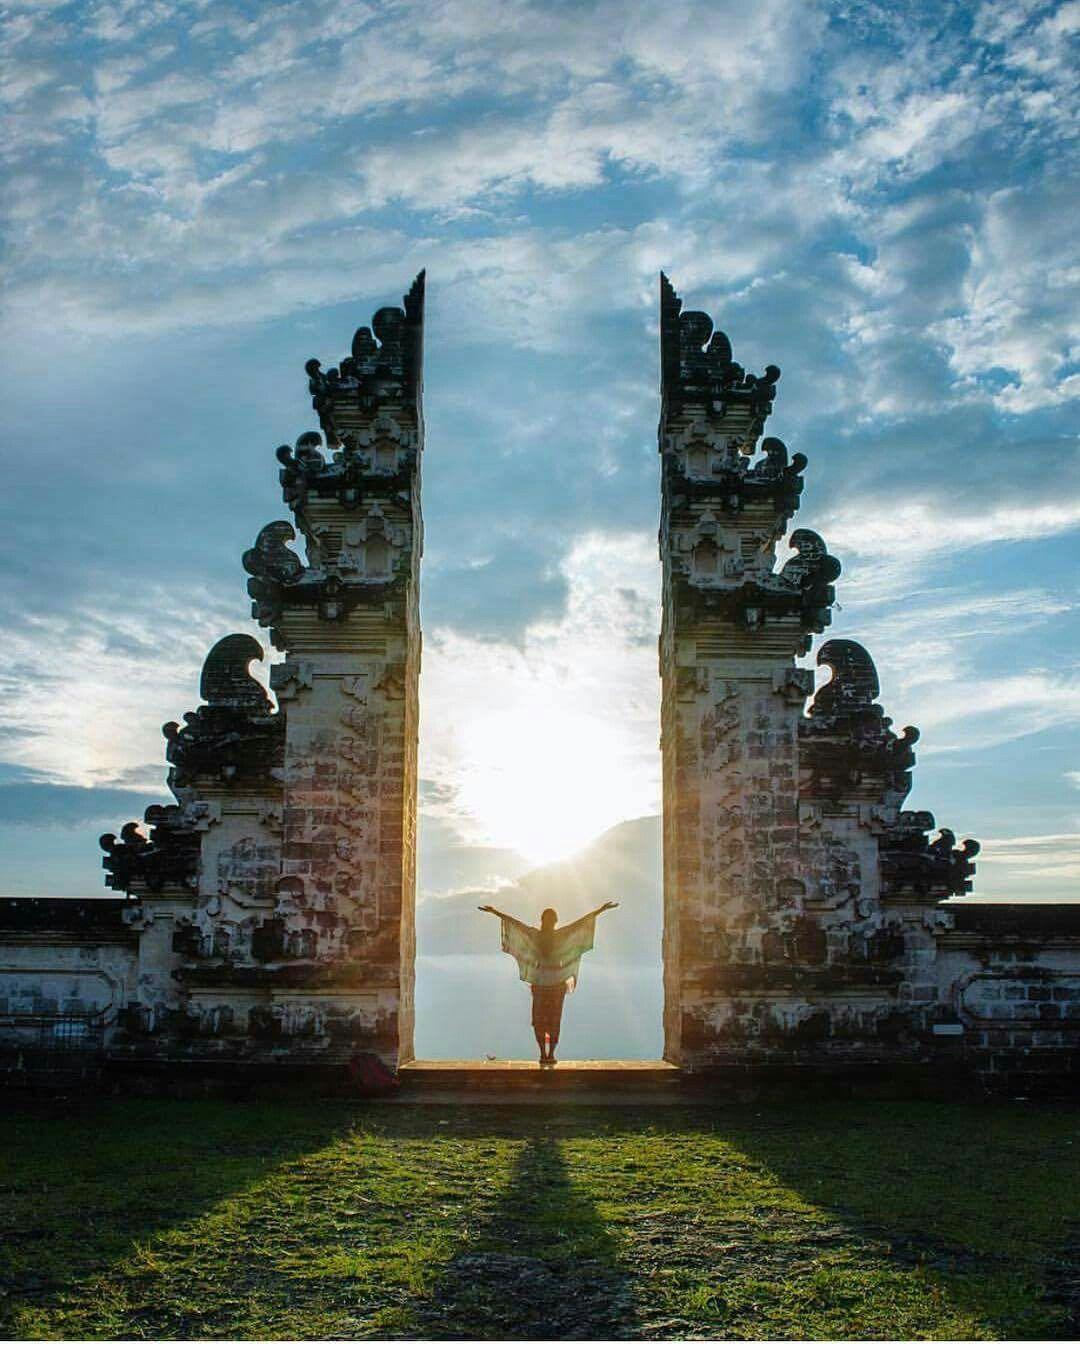 Lempuyang temple - 1000 stairs temple Bali